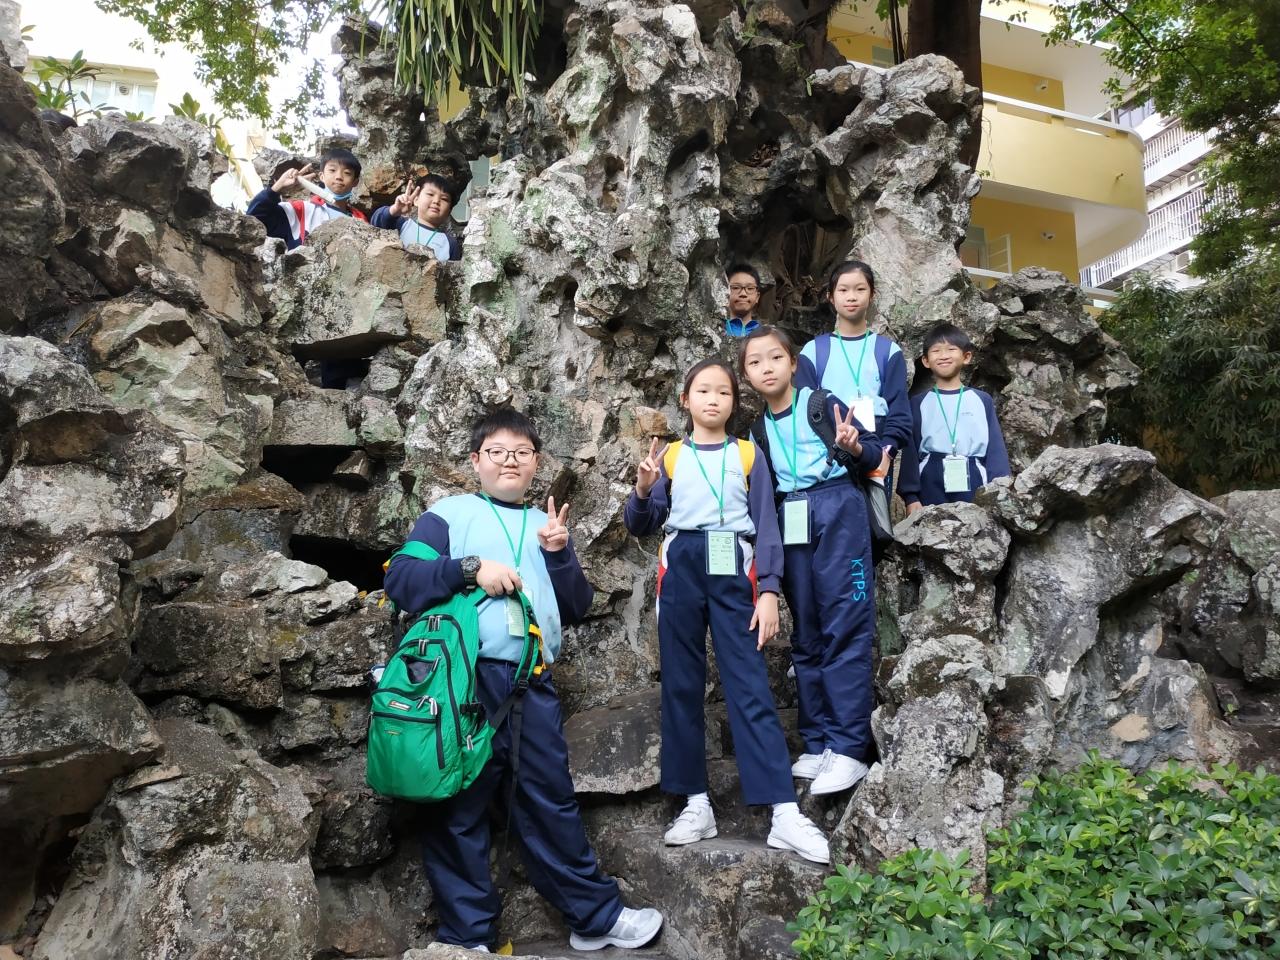 http://keito.school.hk/sites/default/files/batch_img_20191217_105009.jpg